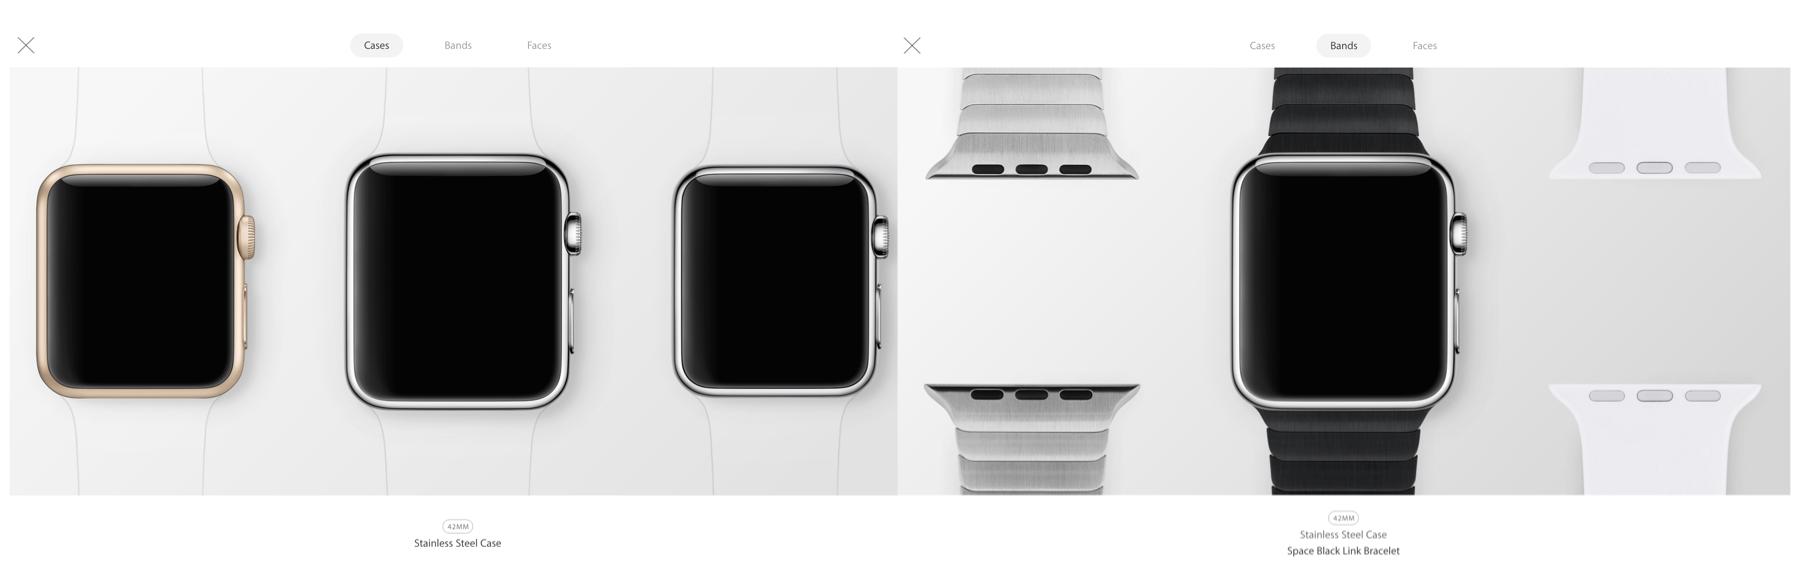 Apple's New Apple Watch Interactive Gallery.